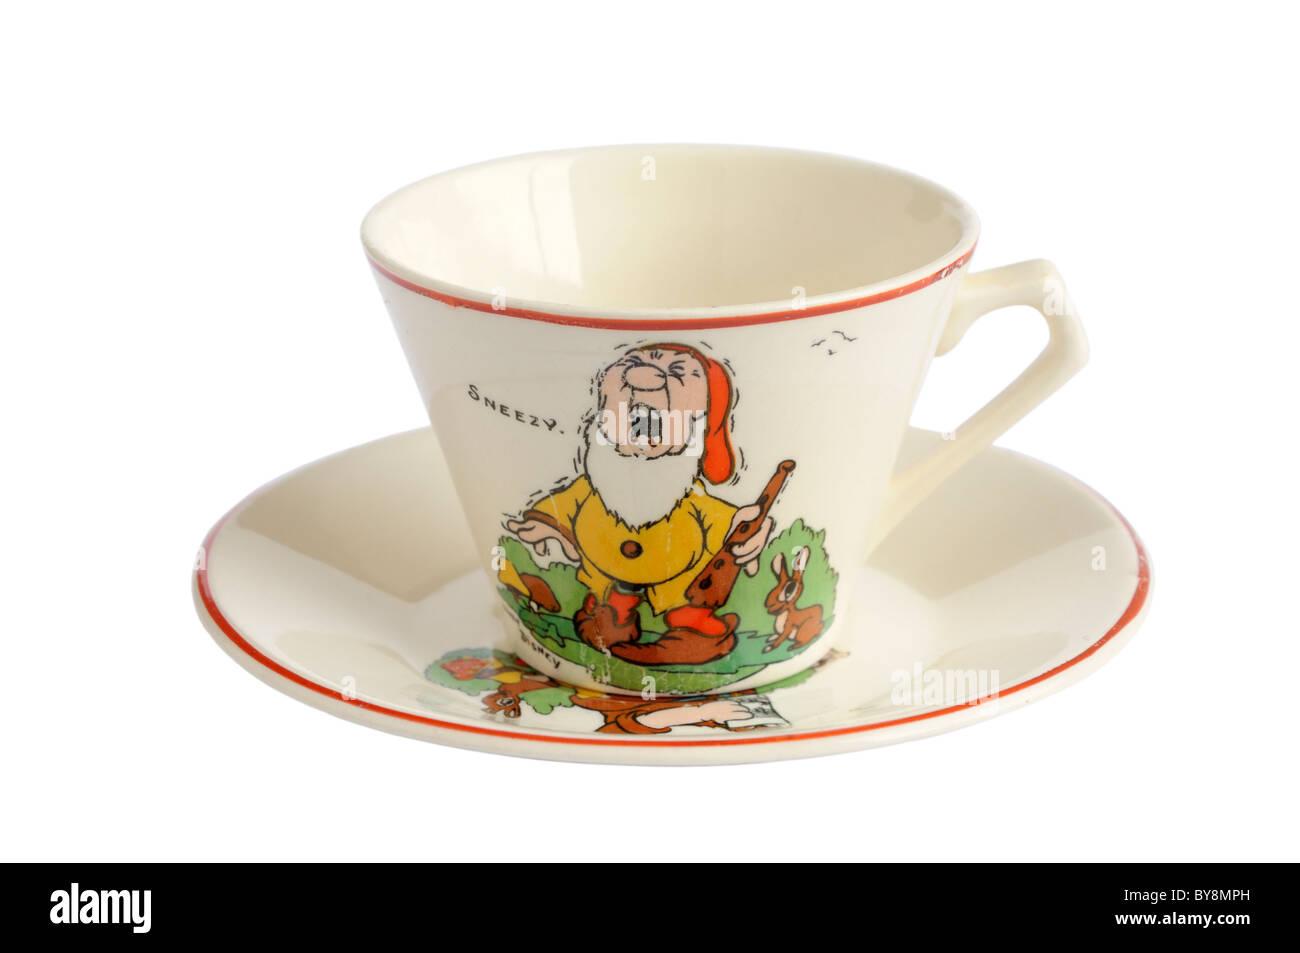 A 1930's Disney doll's tea cup - Stock Image